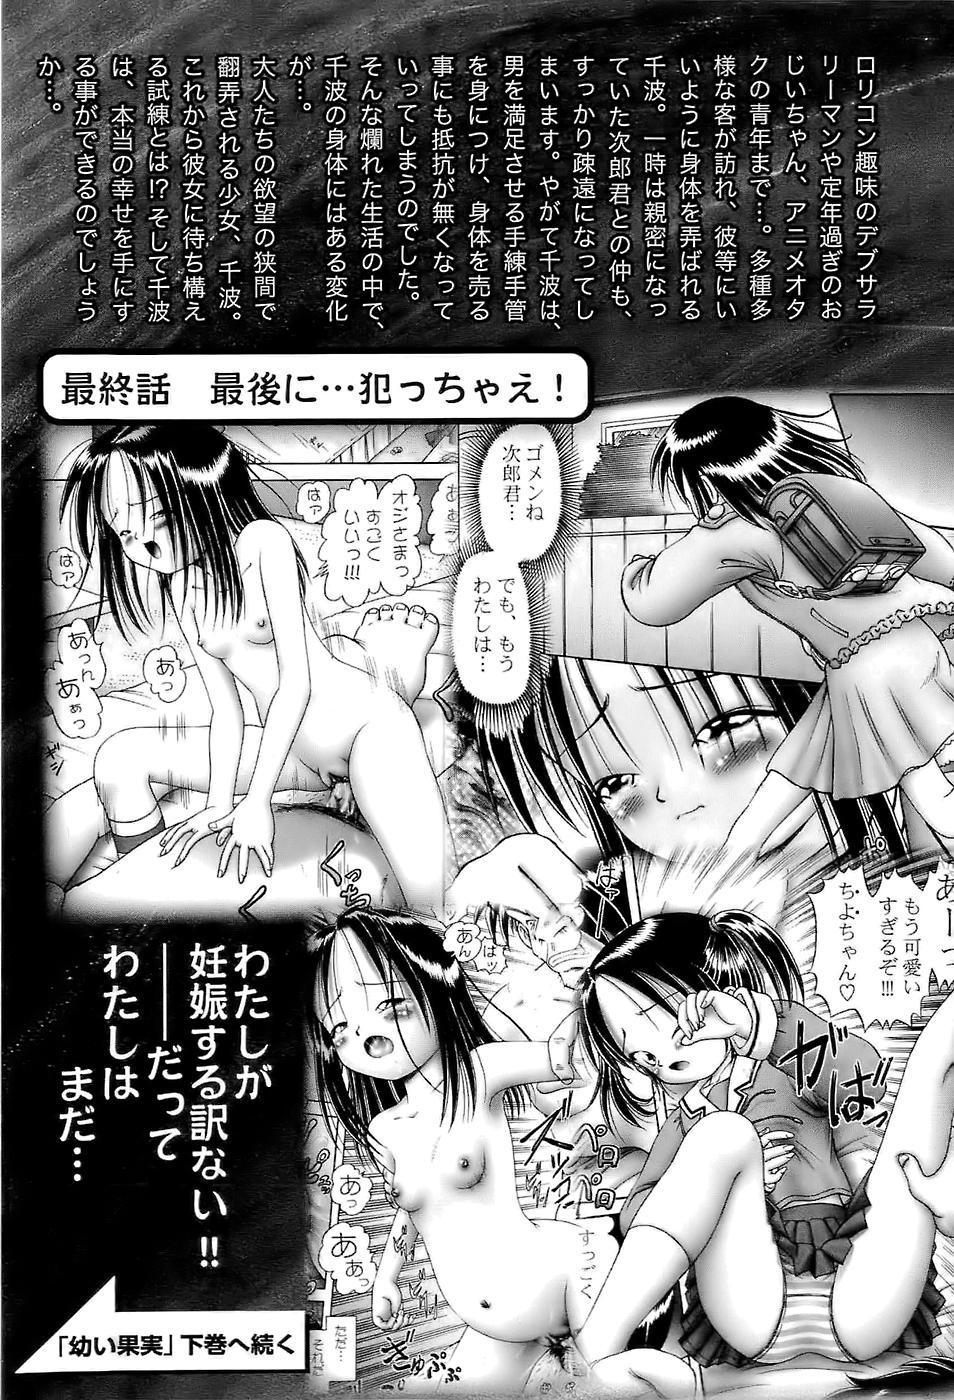 [Bow Rei] Osanai Kajitsu -Inkou Shougakusei no Houkago- Jou 126